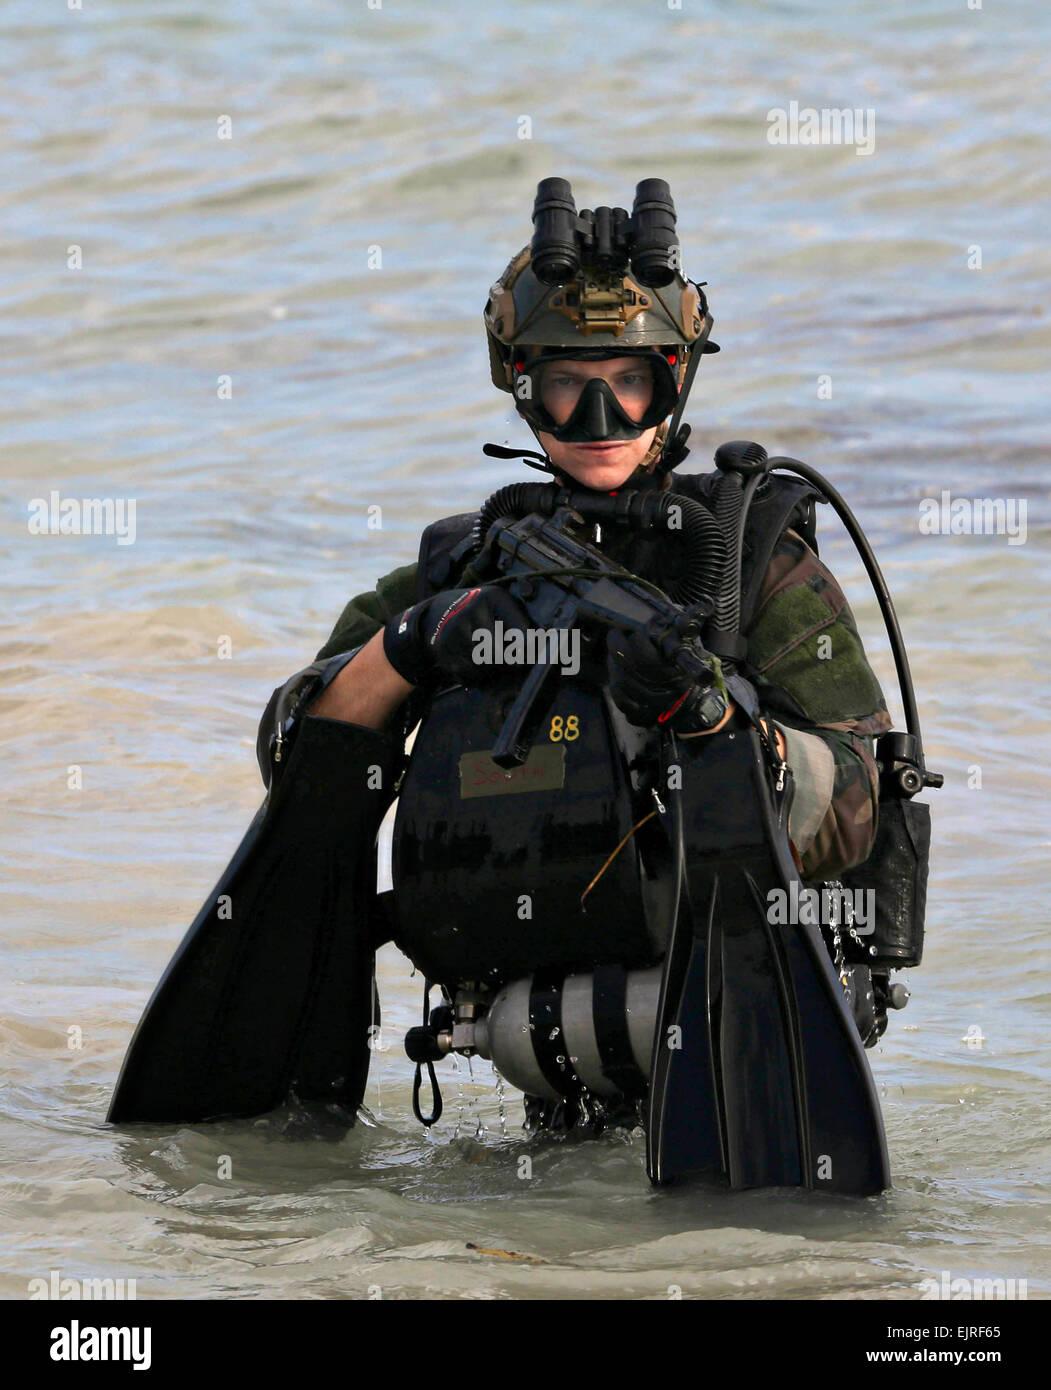 US Marines Reconnaissance Special Operations Commando